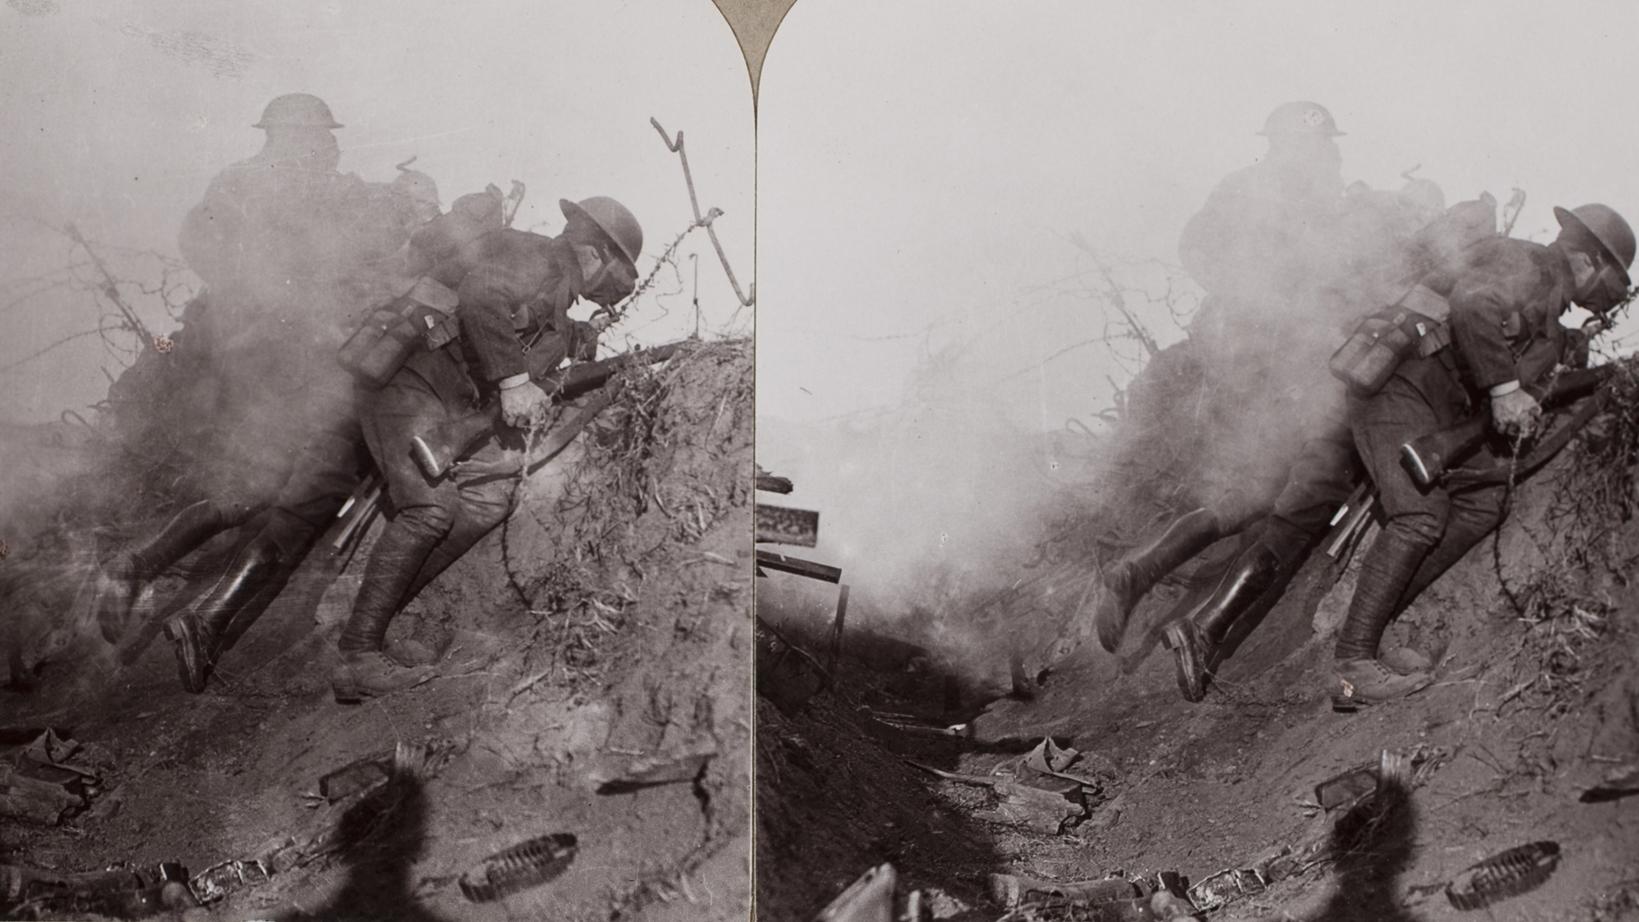 Broken mirrors the First World War and modernist literature